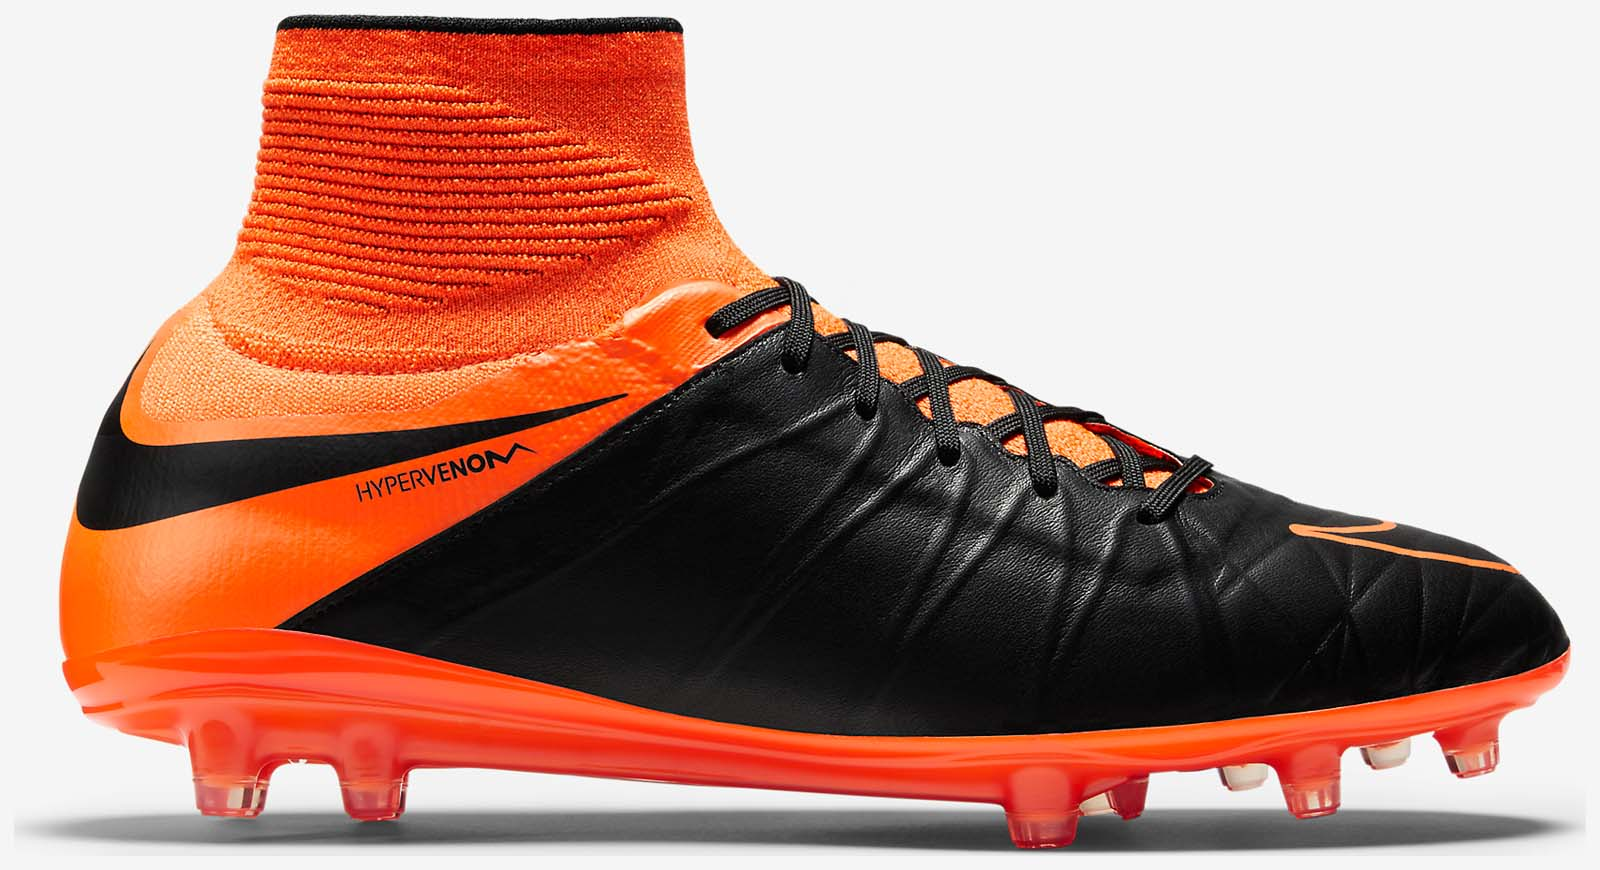 Nike Hypervenom 2 Leather Boots Released - Footy Headlines